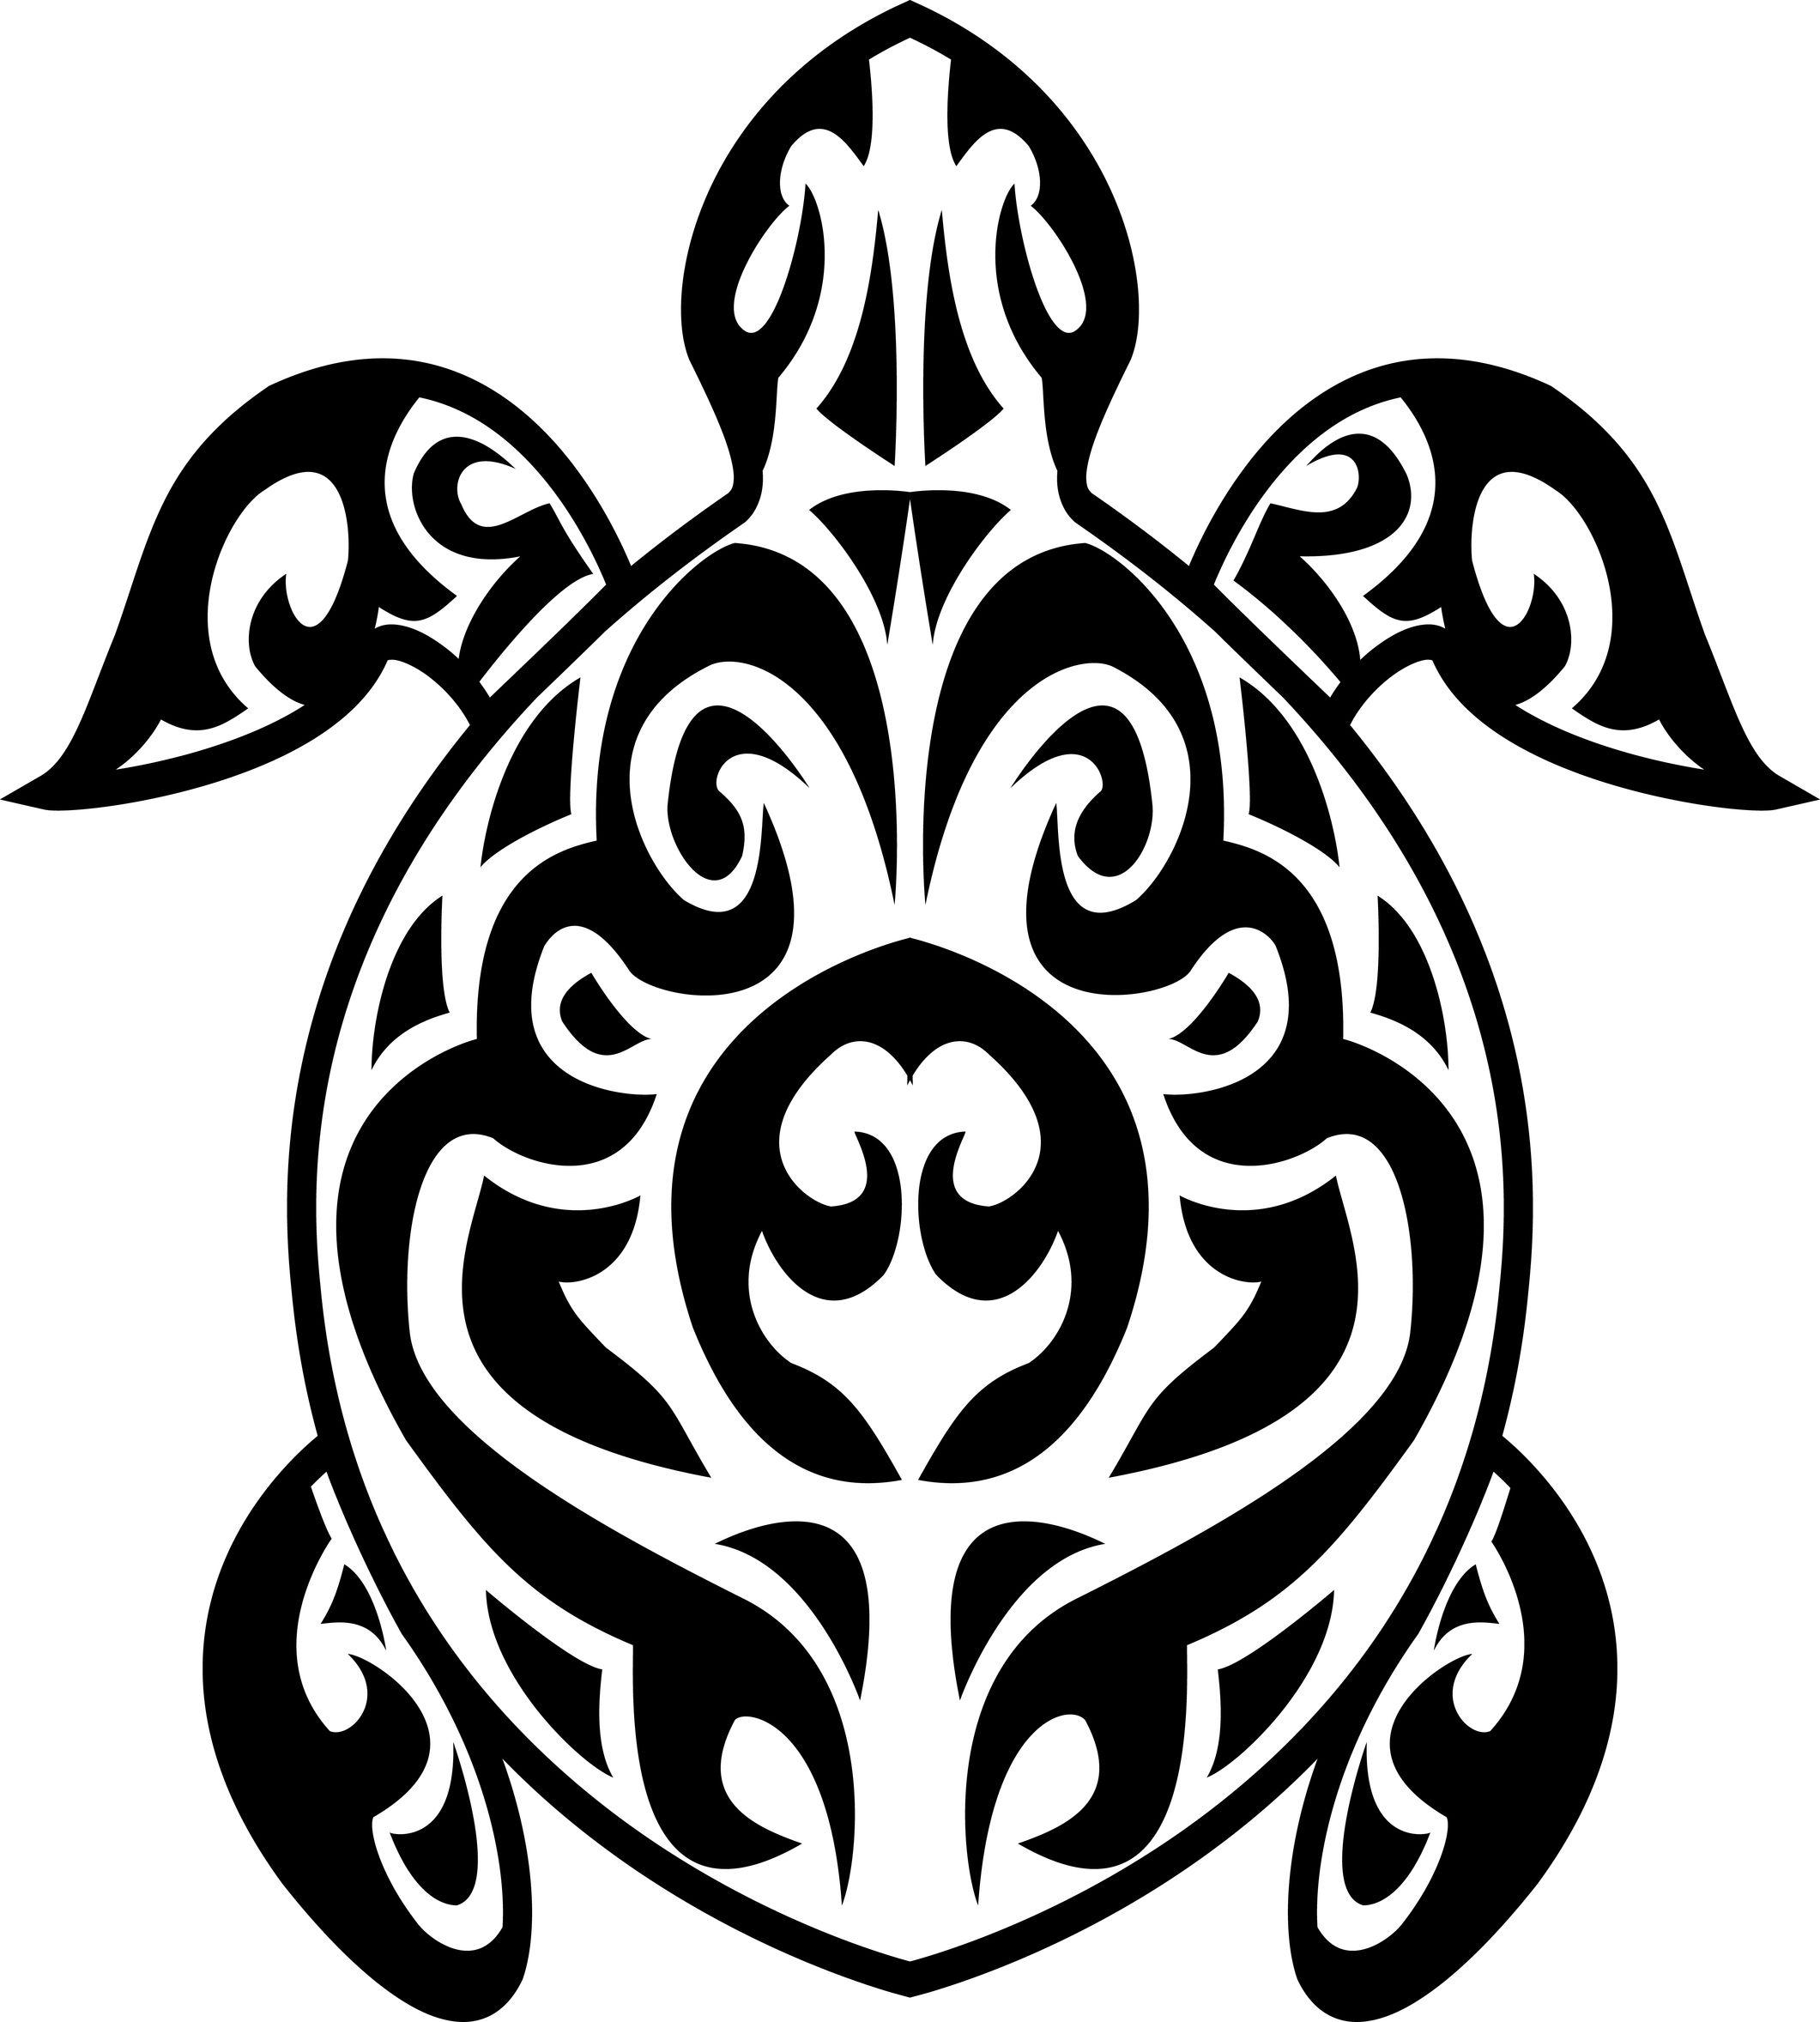 Tattoo Art Black And White: Clipart Panda - Free Clipart